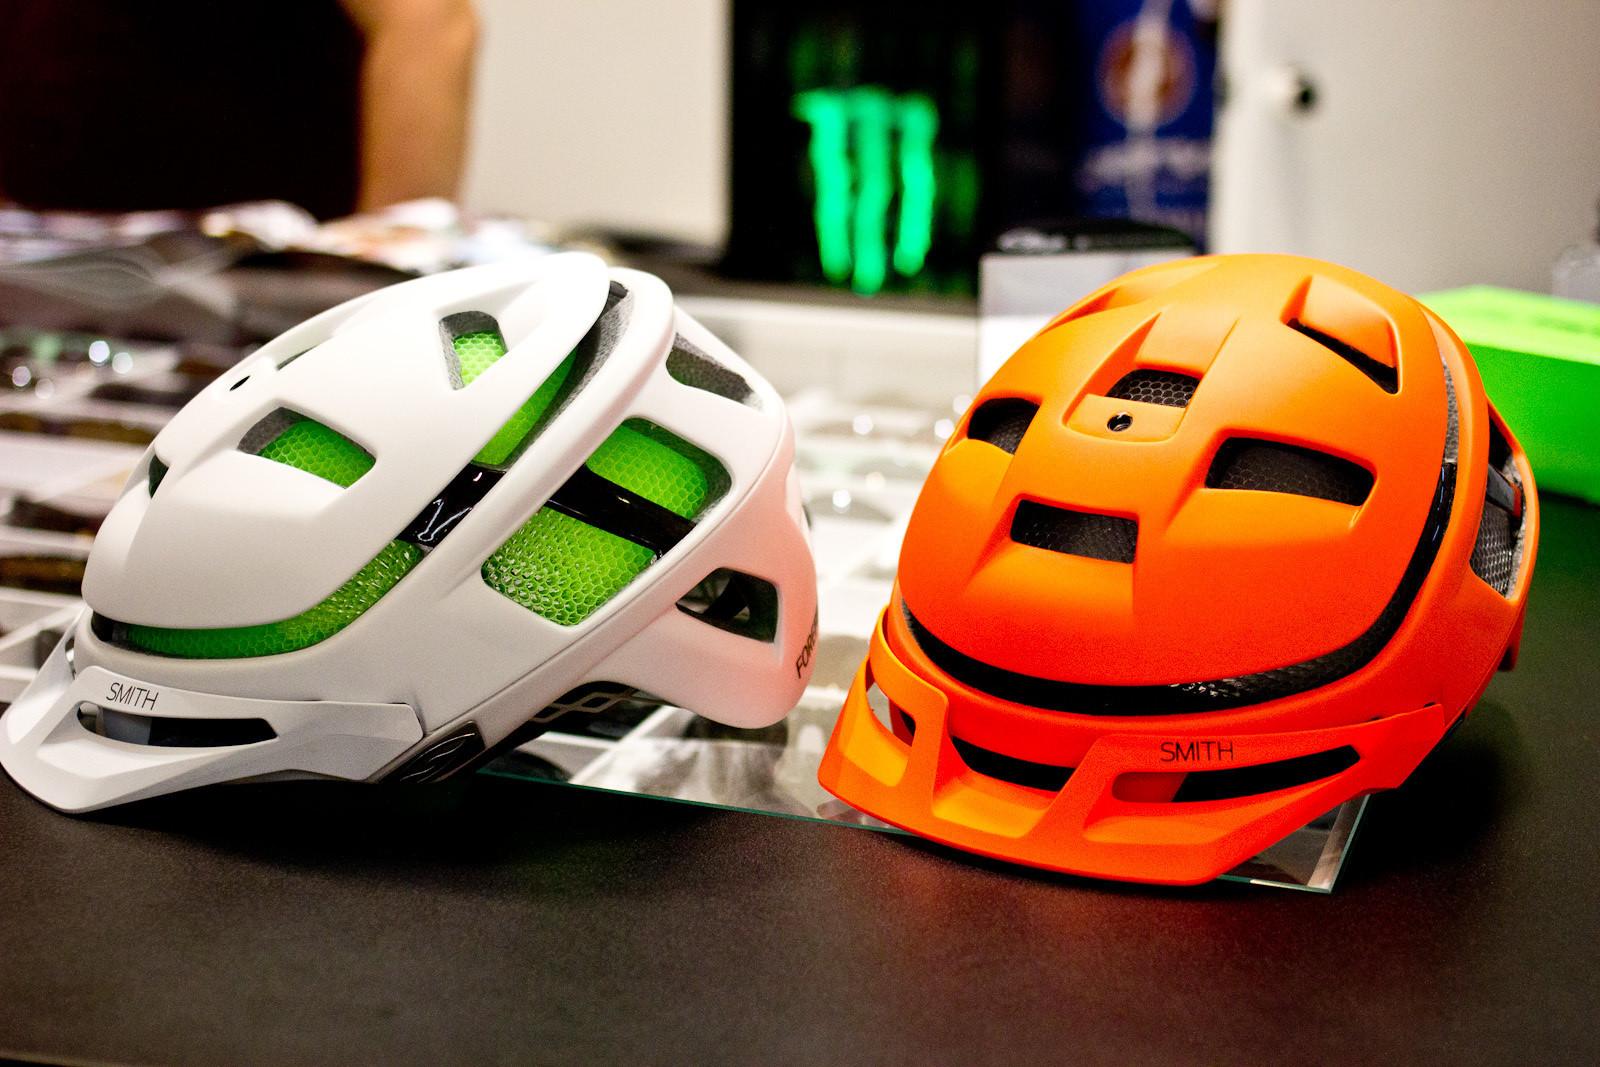 Smith Forefront Helmet - 2014 Mountain Bike Apparel & Protection at Eurobike 2013 - Mountain Biking Pictures - Vital MTB